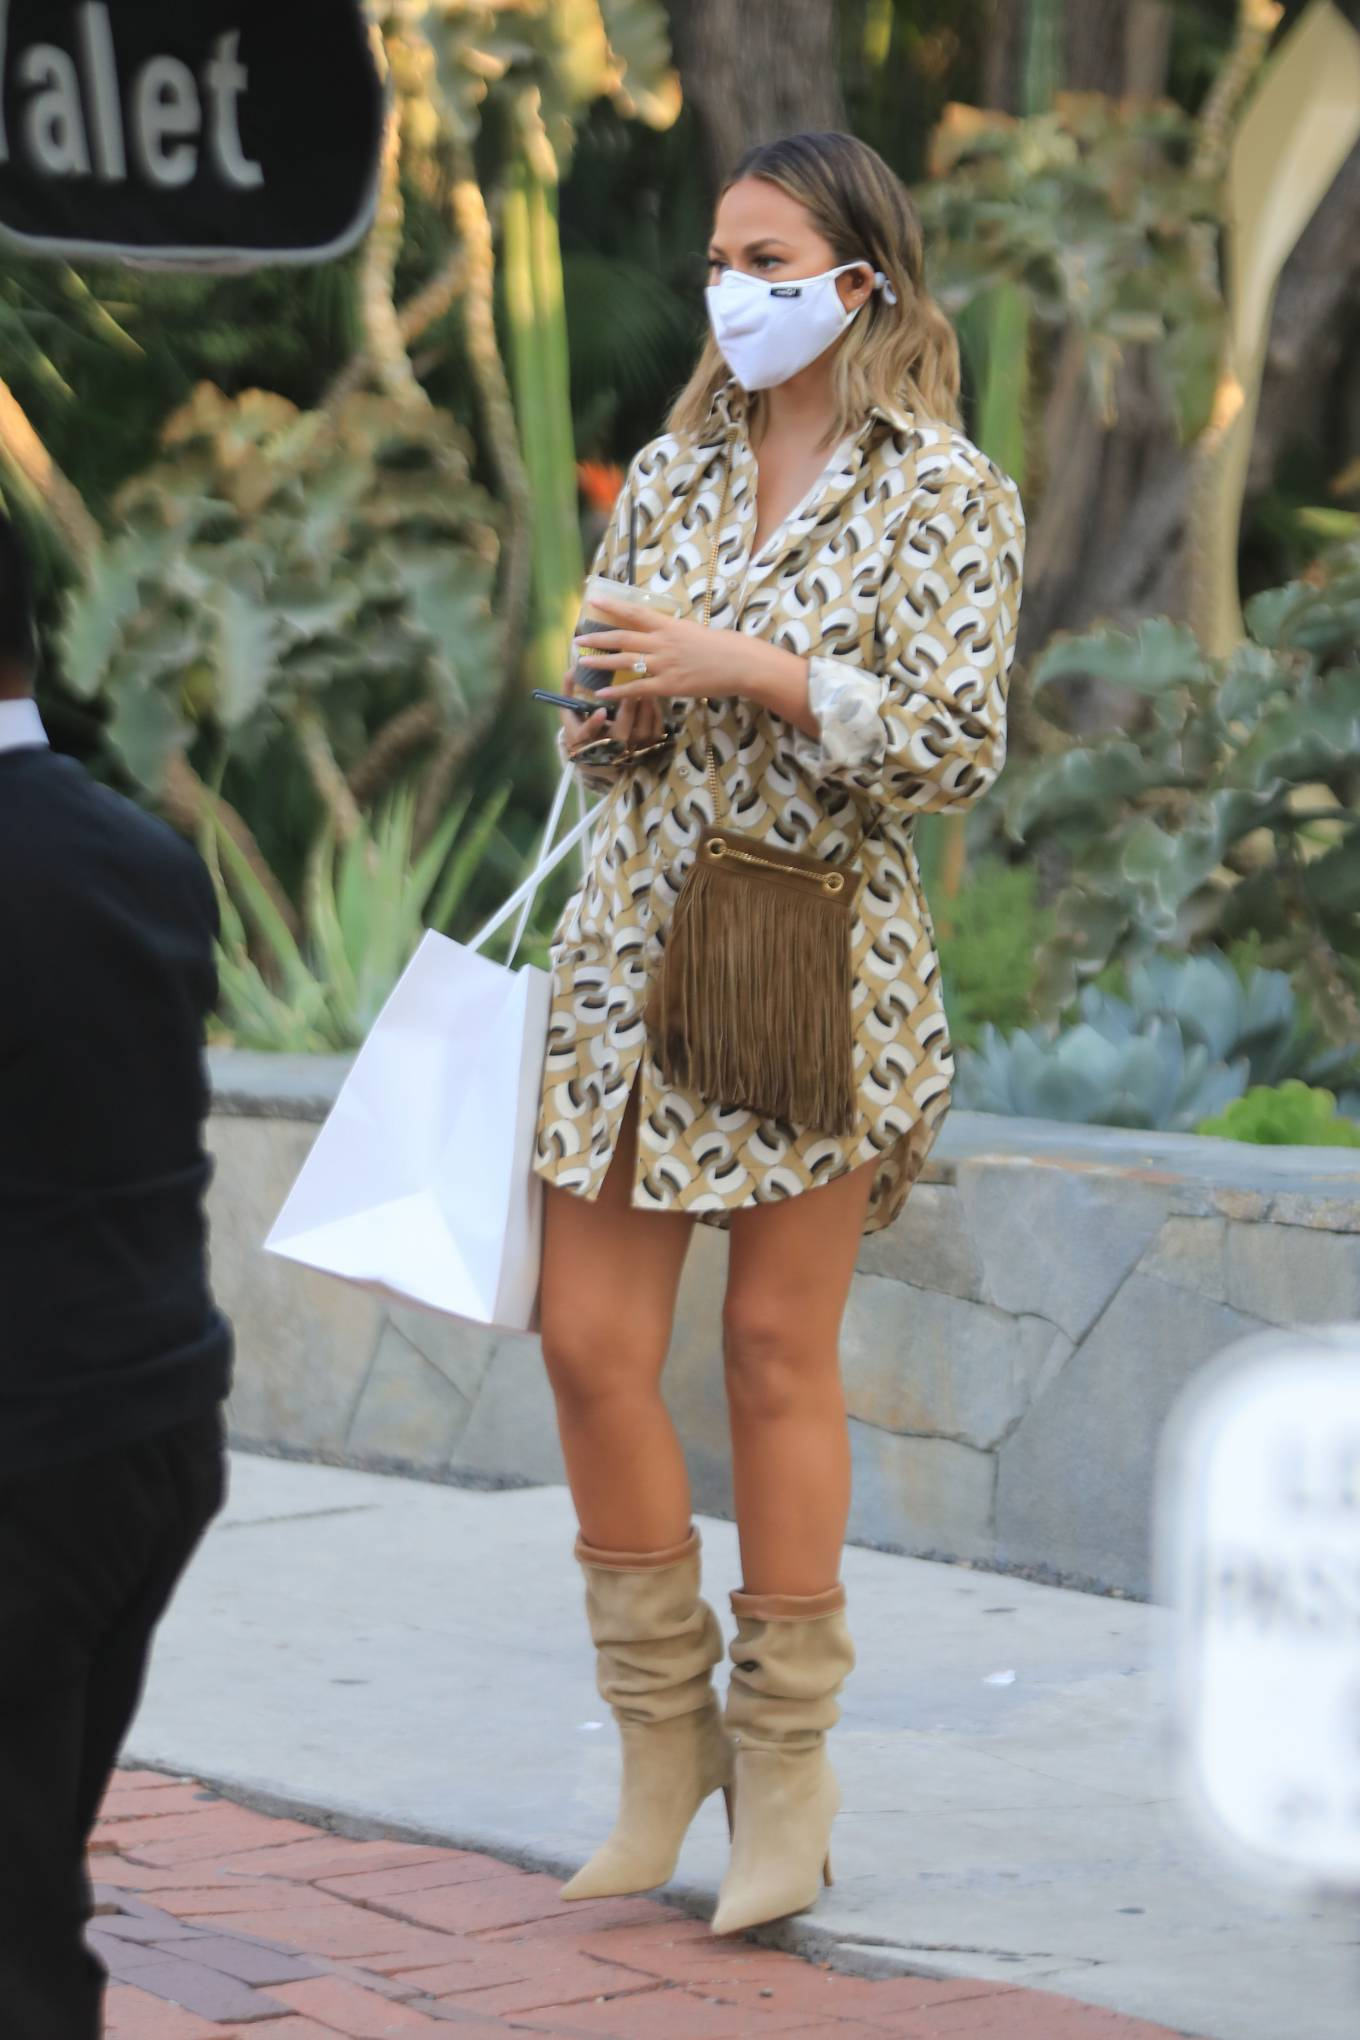 Chrissy Teigen with John Legend - Shopping candids on Melrose place